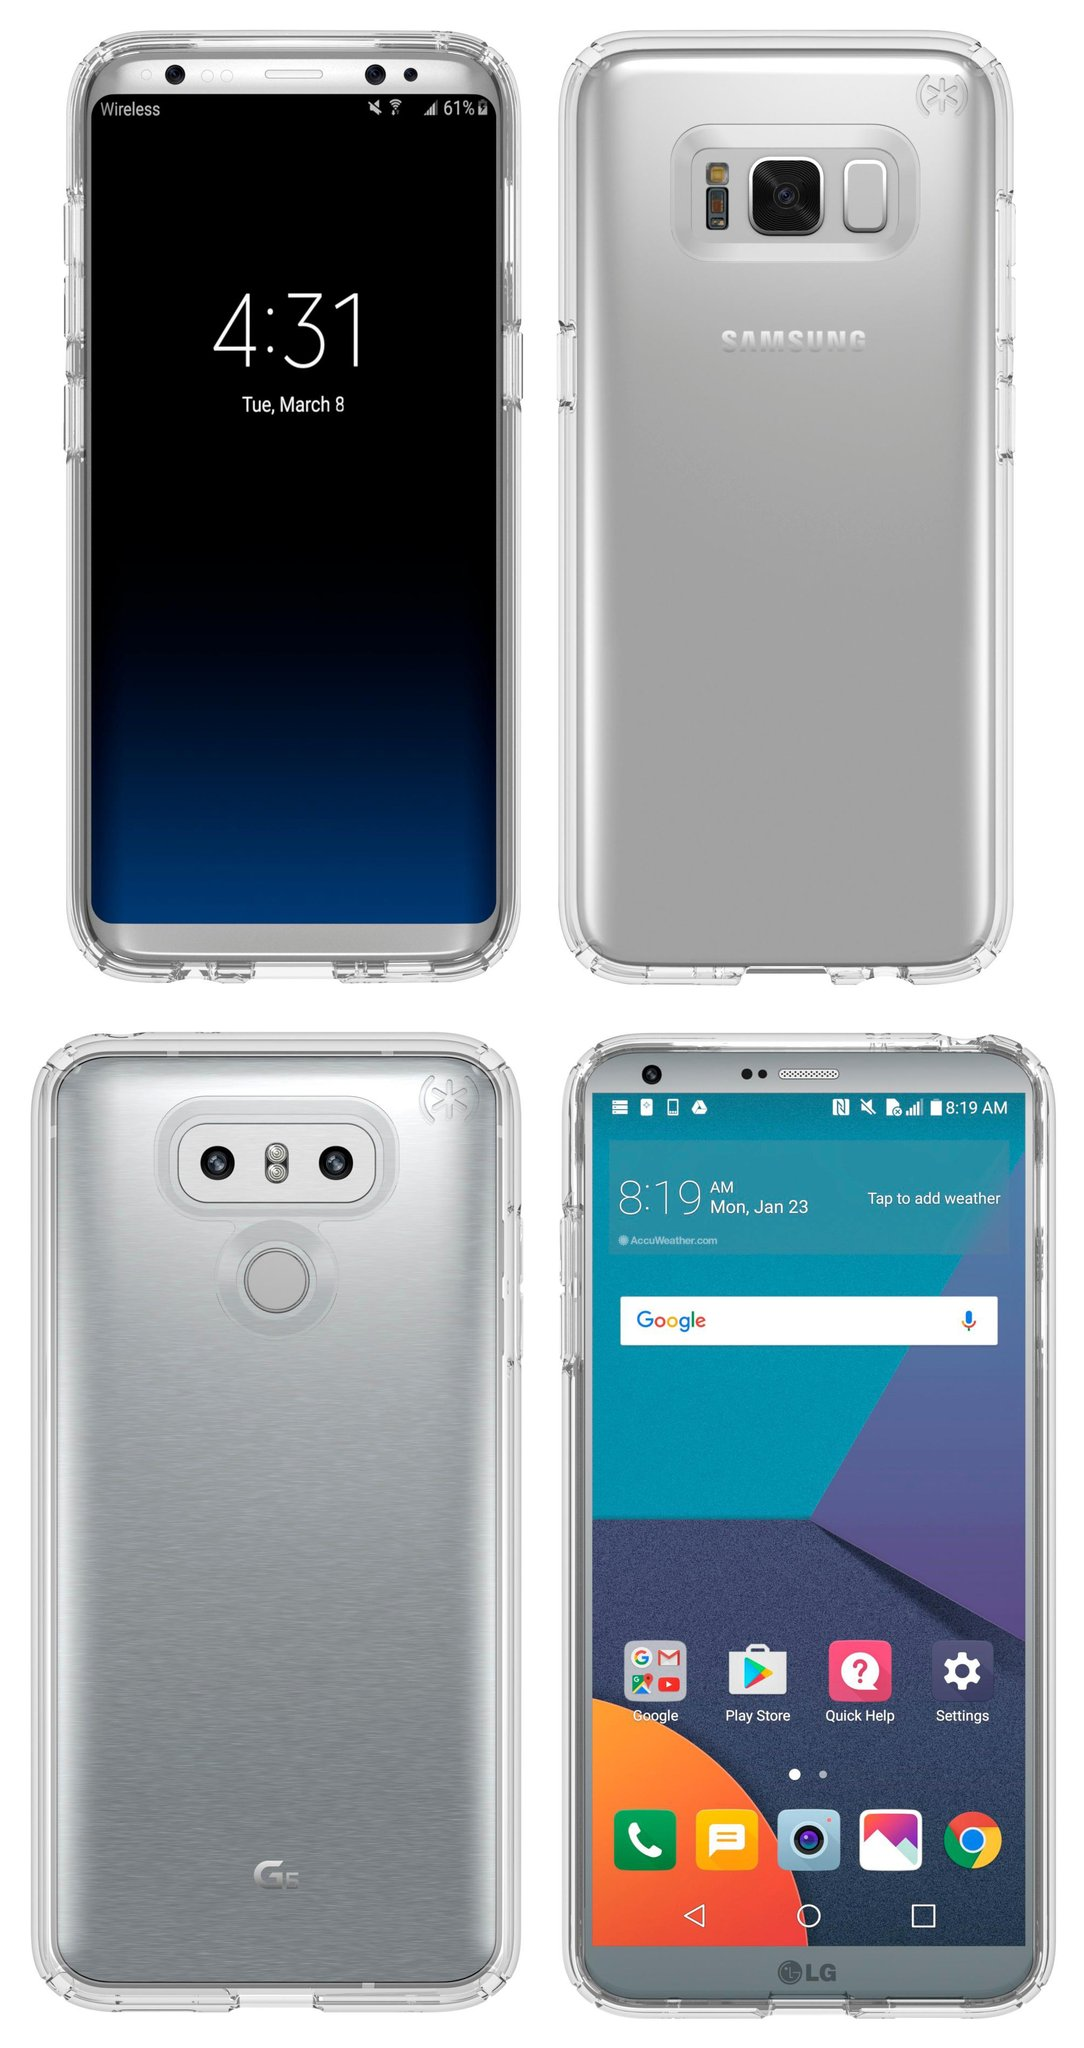 low priced 7b4ec 0424b Galaxy S8 clear case leaks in new photo - SamMobile - SamMobile